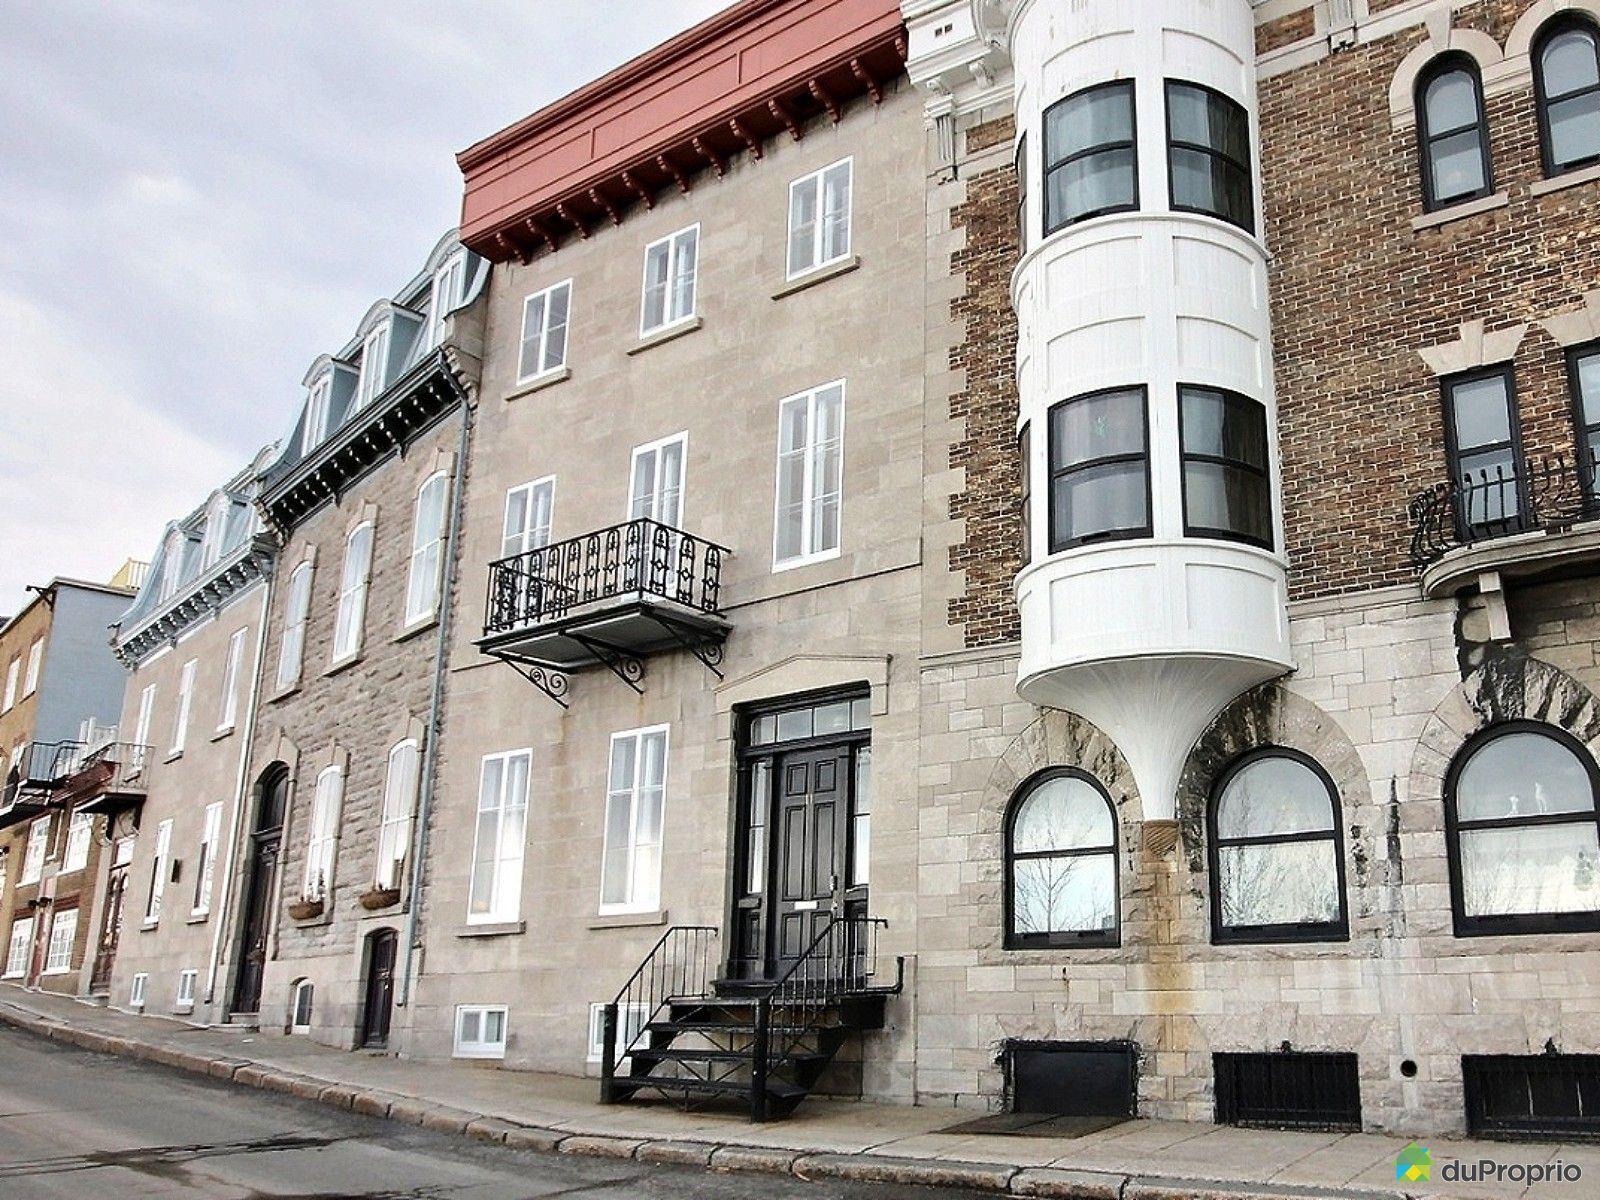 condo vendre vieux qu bec 2 11 rue des remparts immobilier qu bec duproprio 603535. Black Bedroom Furniture Sets. Home Design Ideas